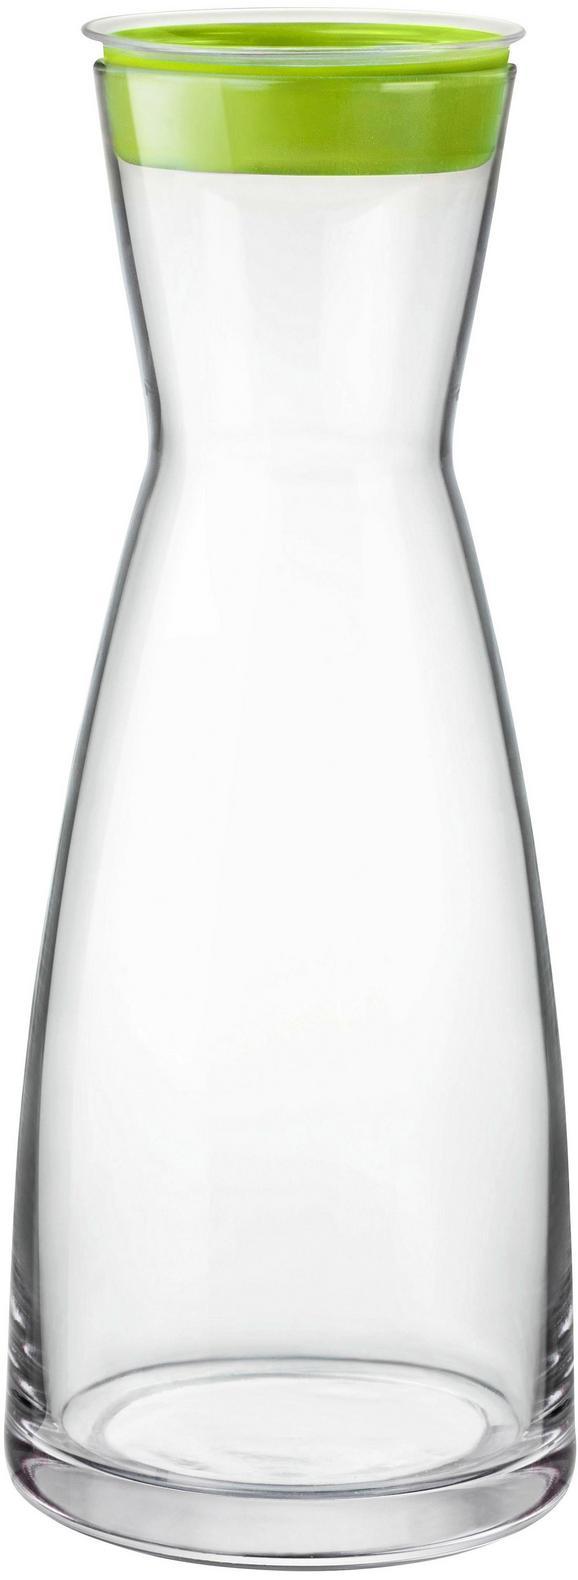 Wasserkaraffe Brio - Türkis/Klar, Glas (1l) - Mömax modern living